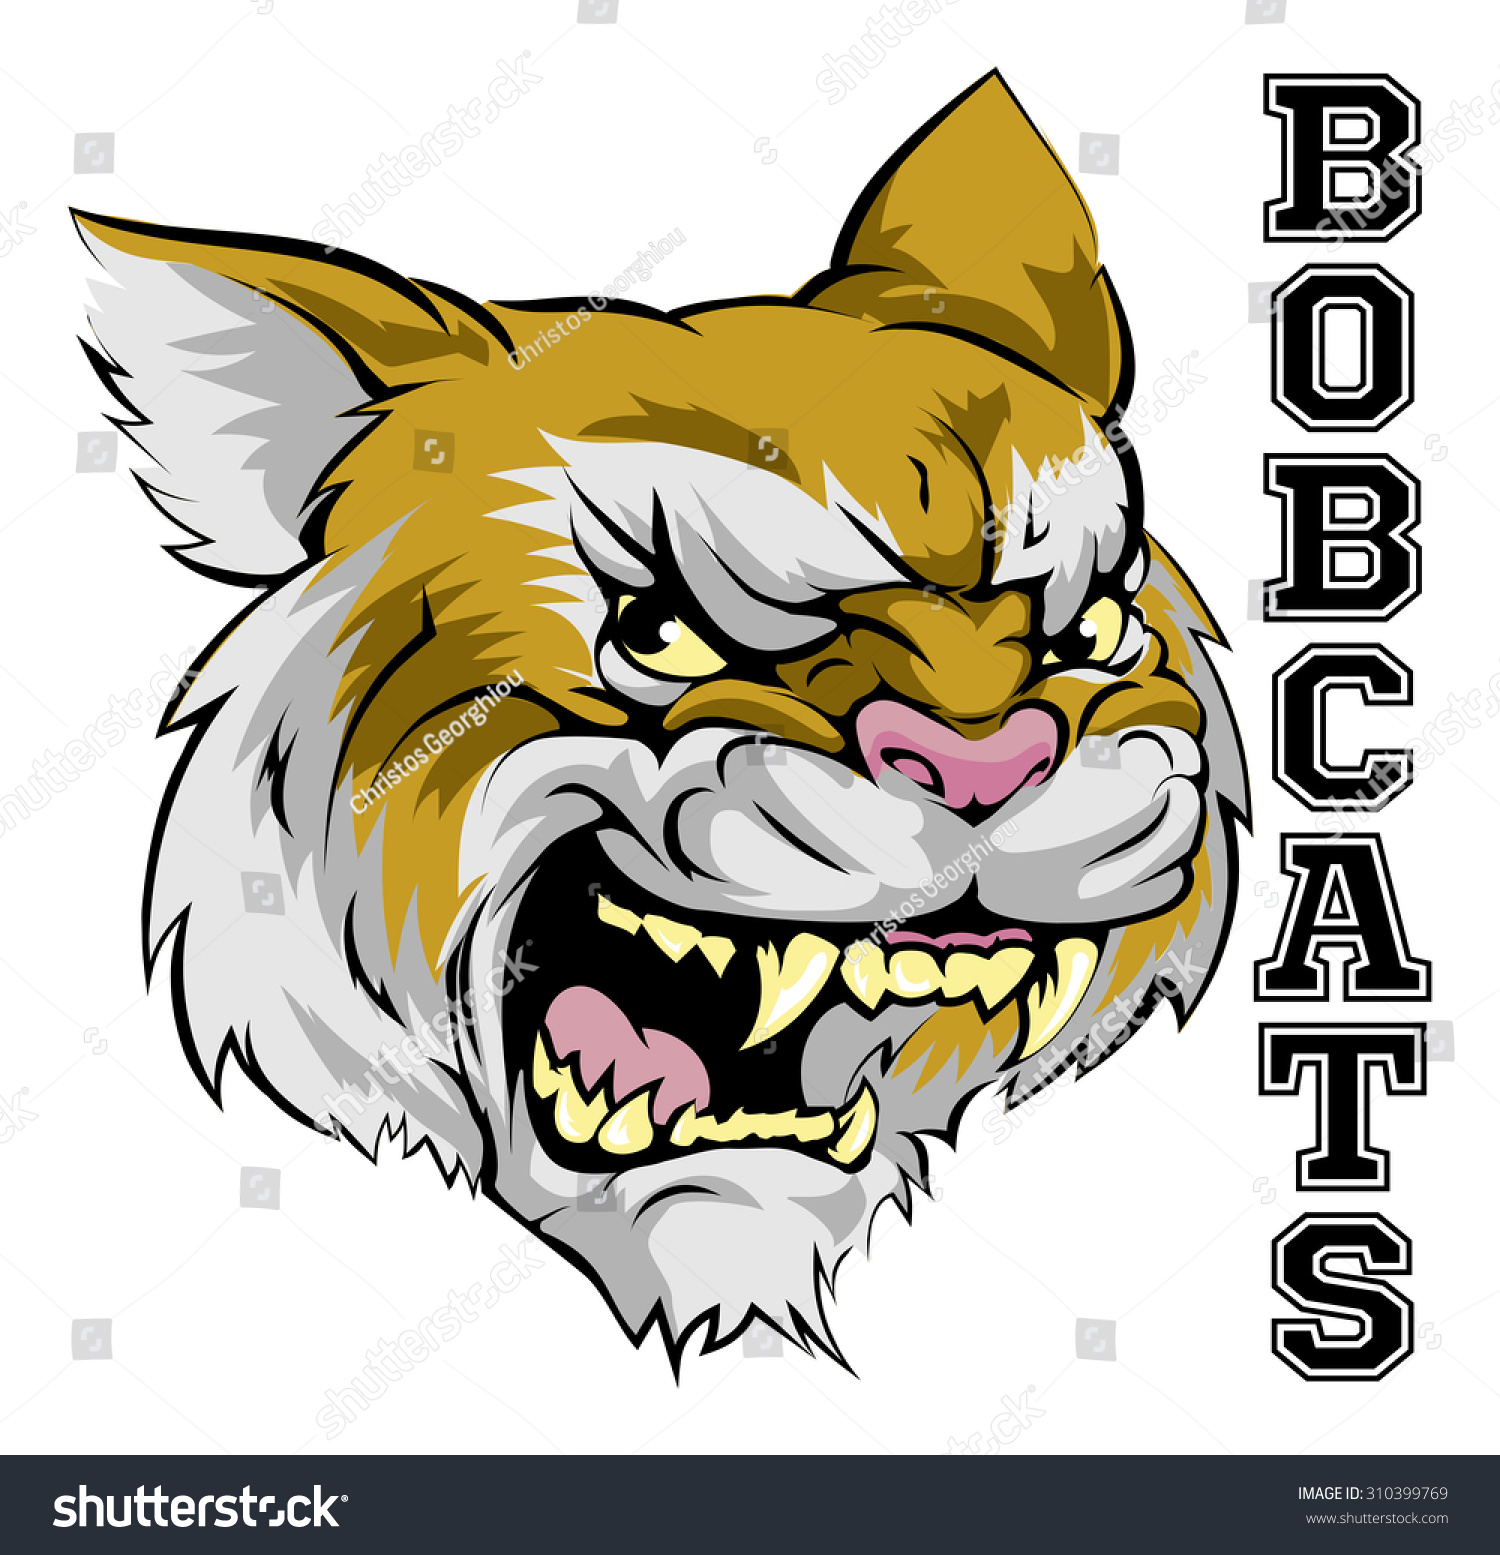 Illustration Cartoon Bobcat Sports Team Mascot Stock Vector Royalty Free 310399769